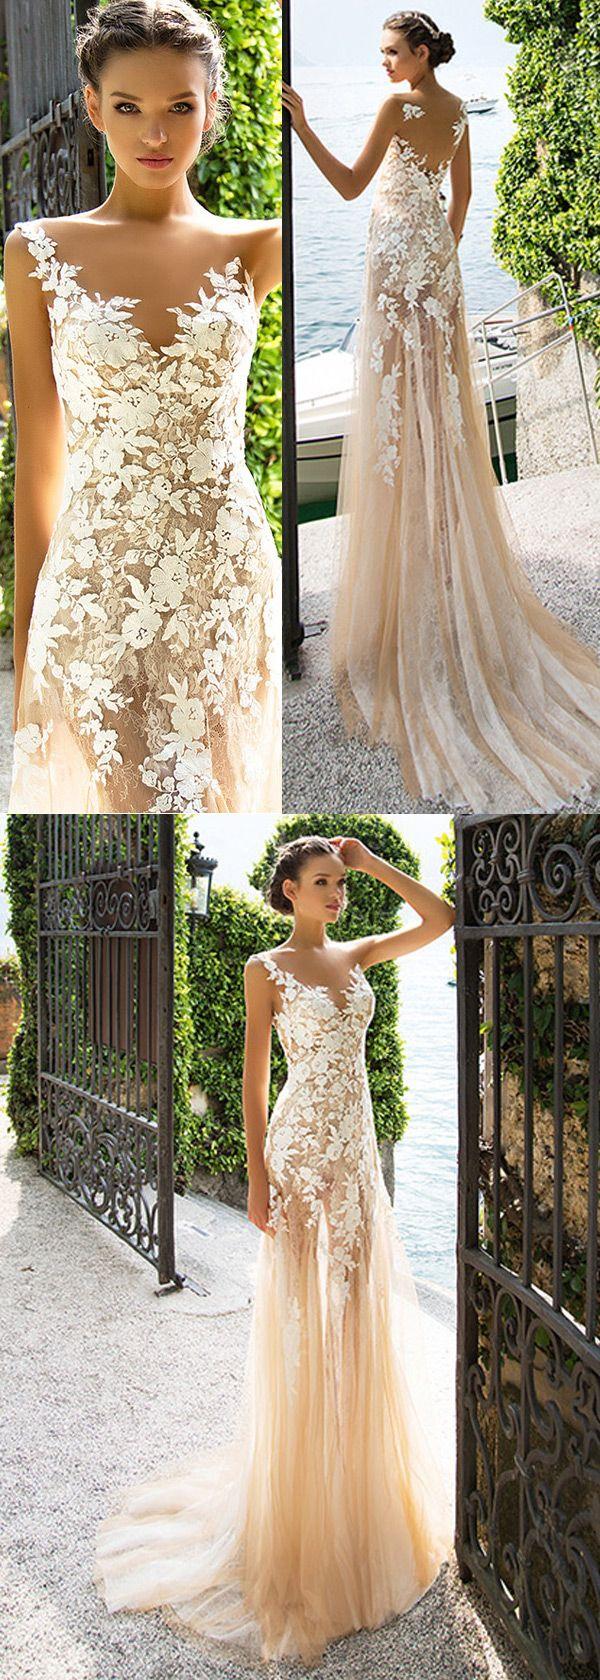 best Свадебные платья images on pinterest bridal gowns